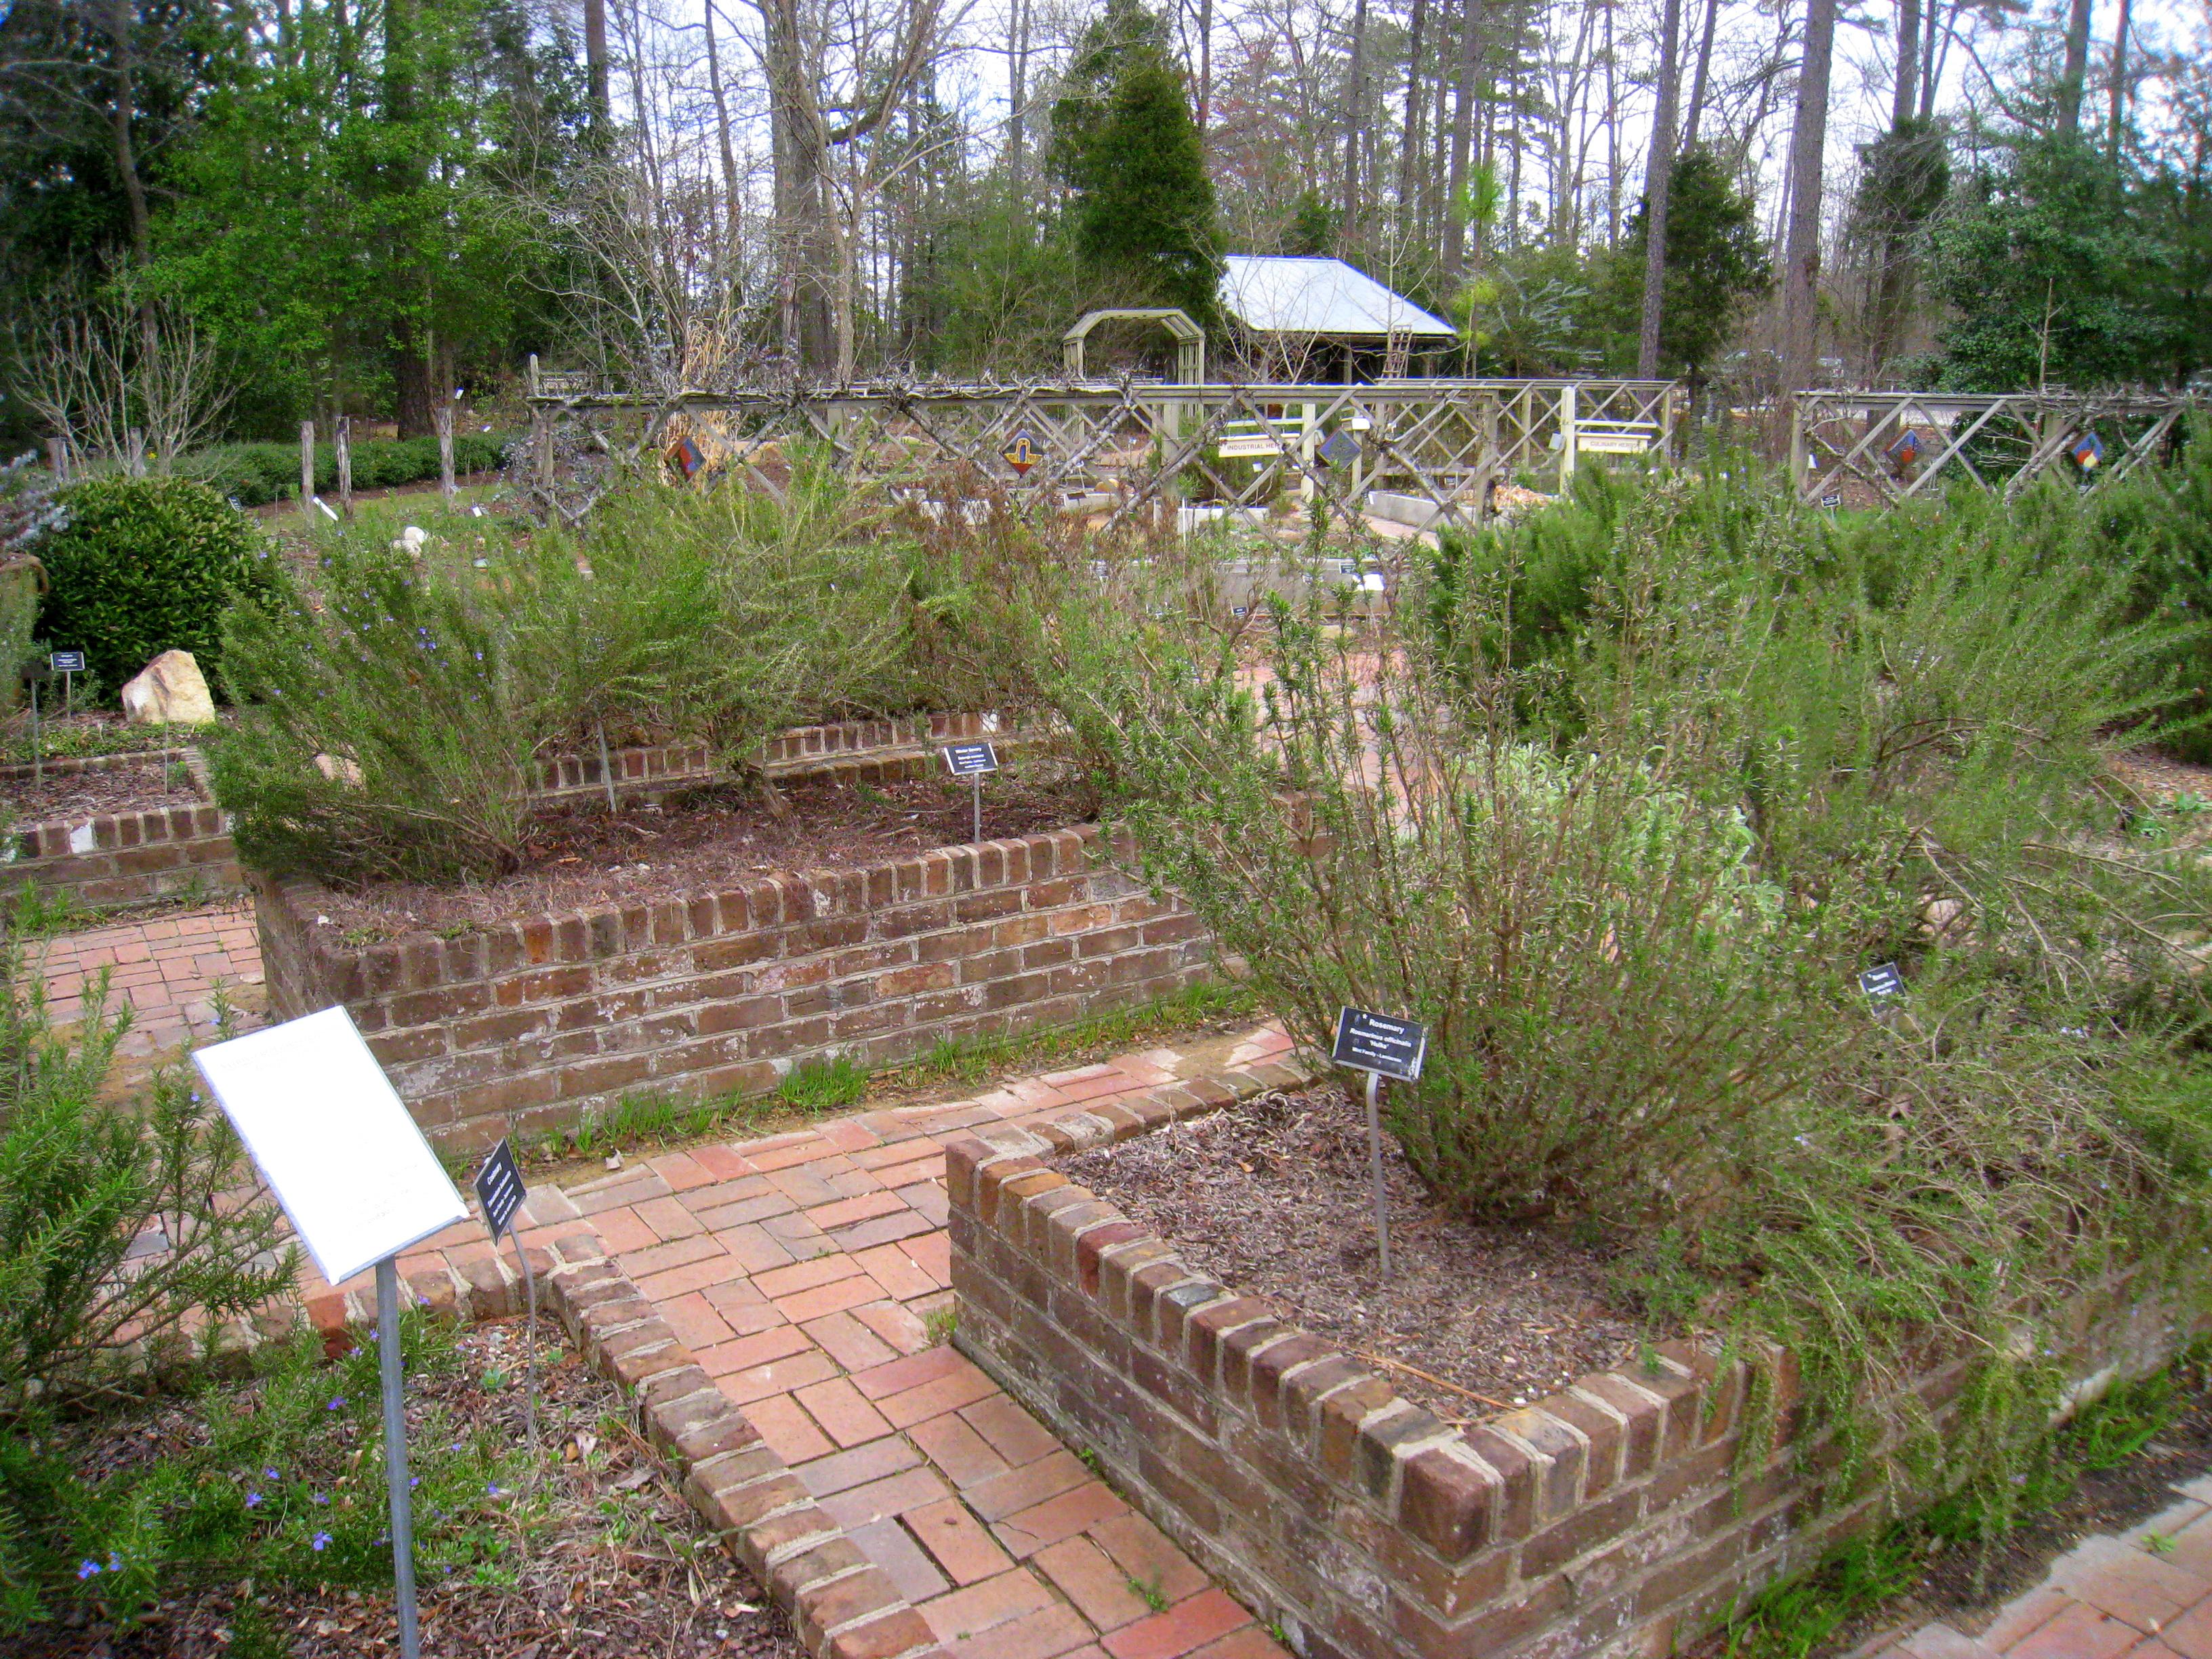 File:North Carolina Botanical Garden - March 15, 2010 - IMG 4948.JPG